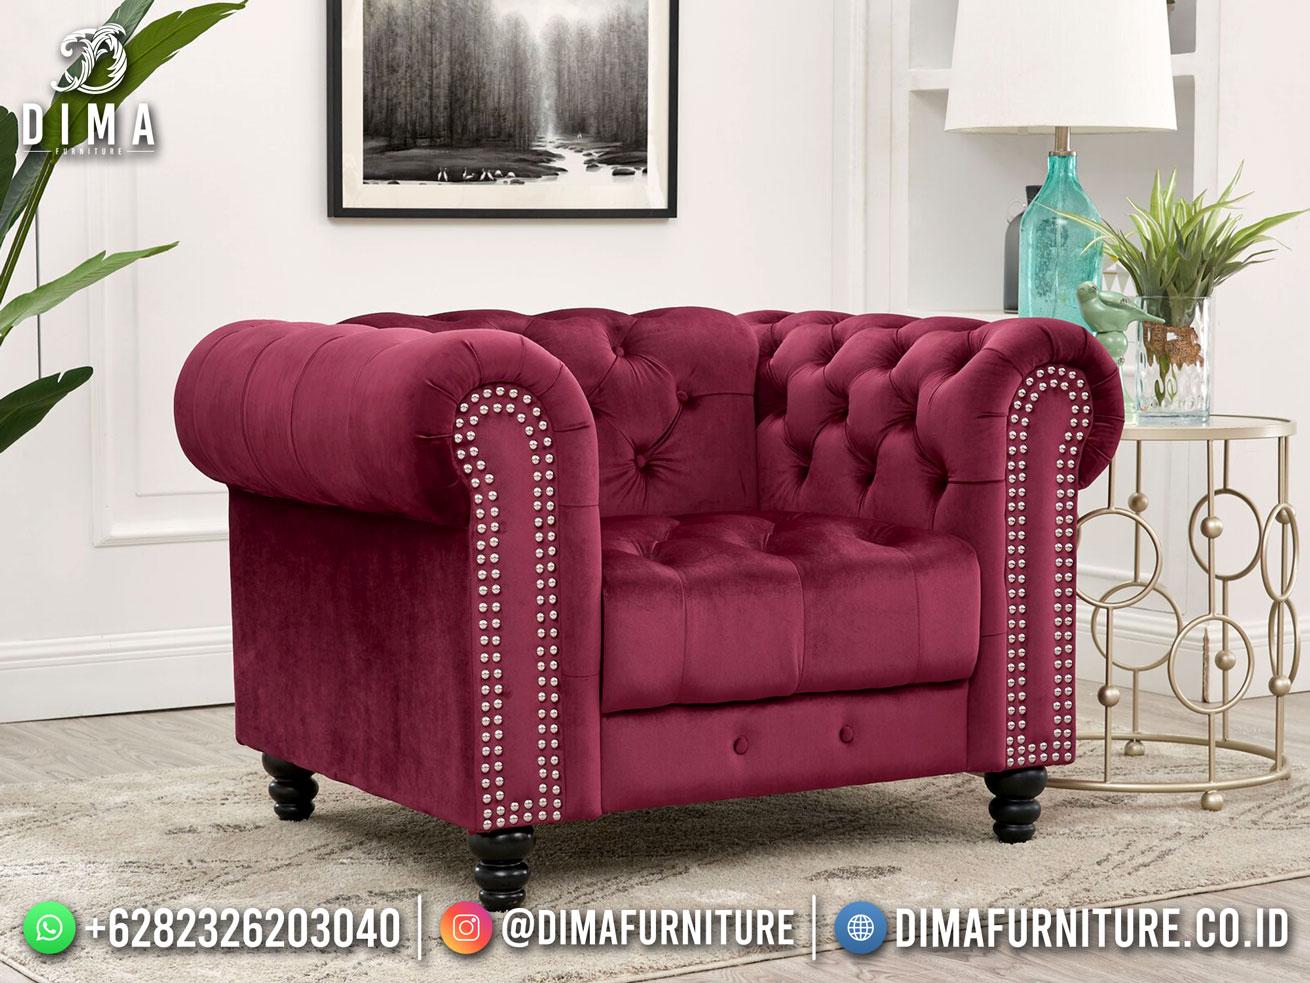 Palazzo 1 Seater Sofa Minimalis Beauty Magenta Good Quality TTJ-1793